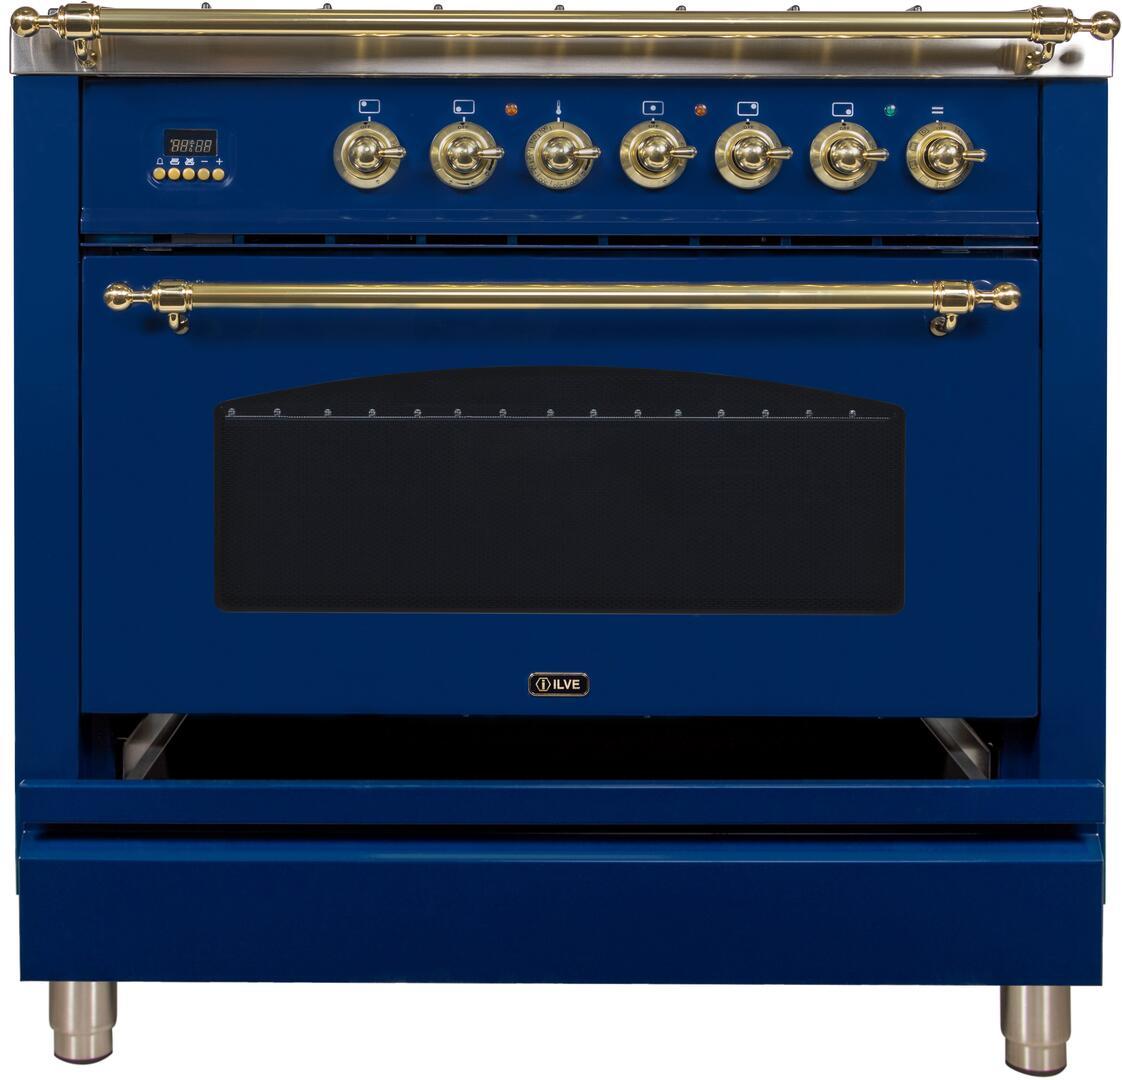 Ilve Nostalgie UPN90FDMPBL Freestanding Dual Fuel Range Blue, ILVE UPN90FDMPBL Range Open Draw